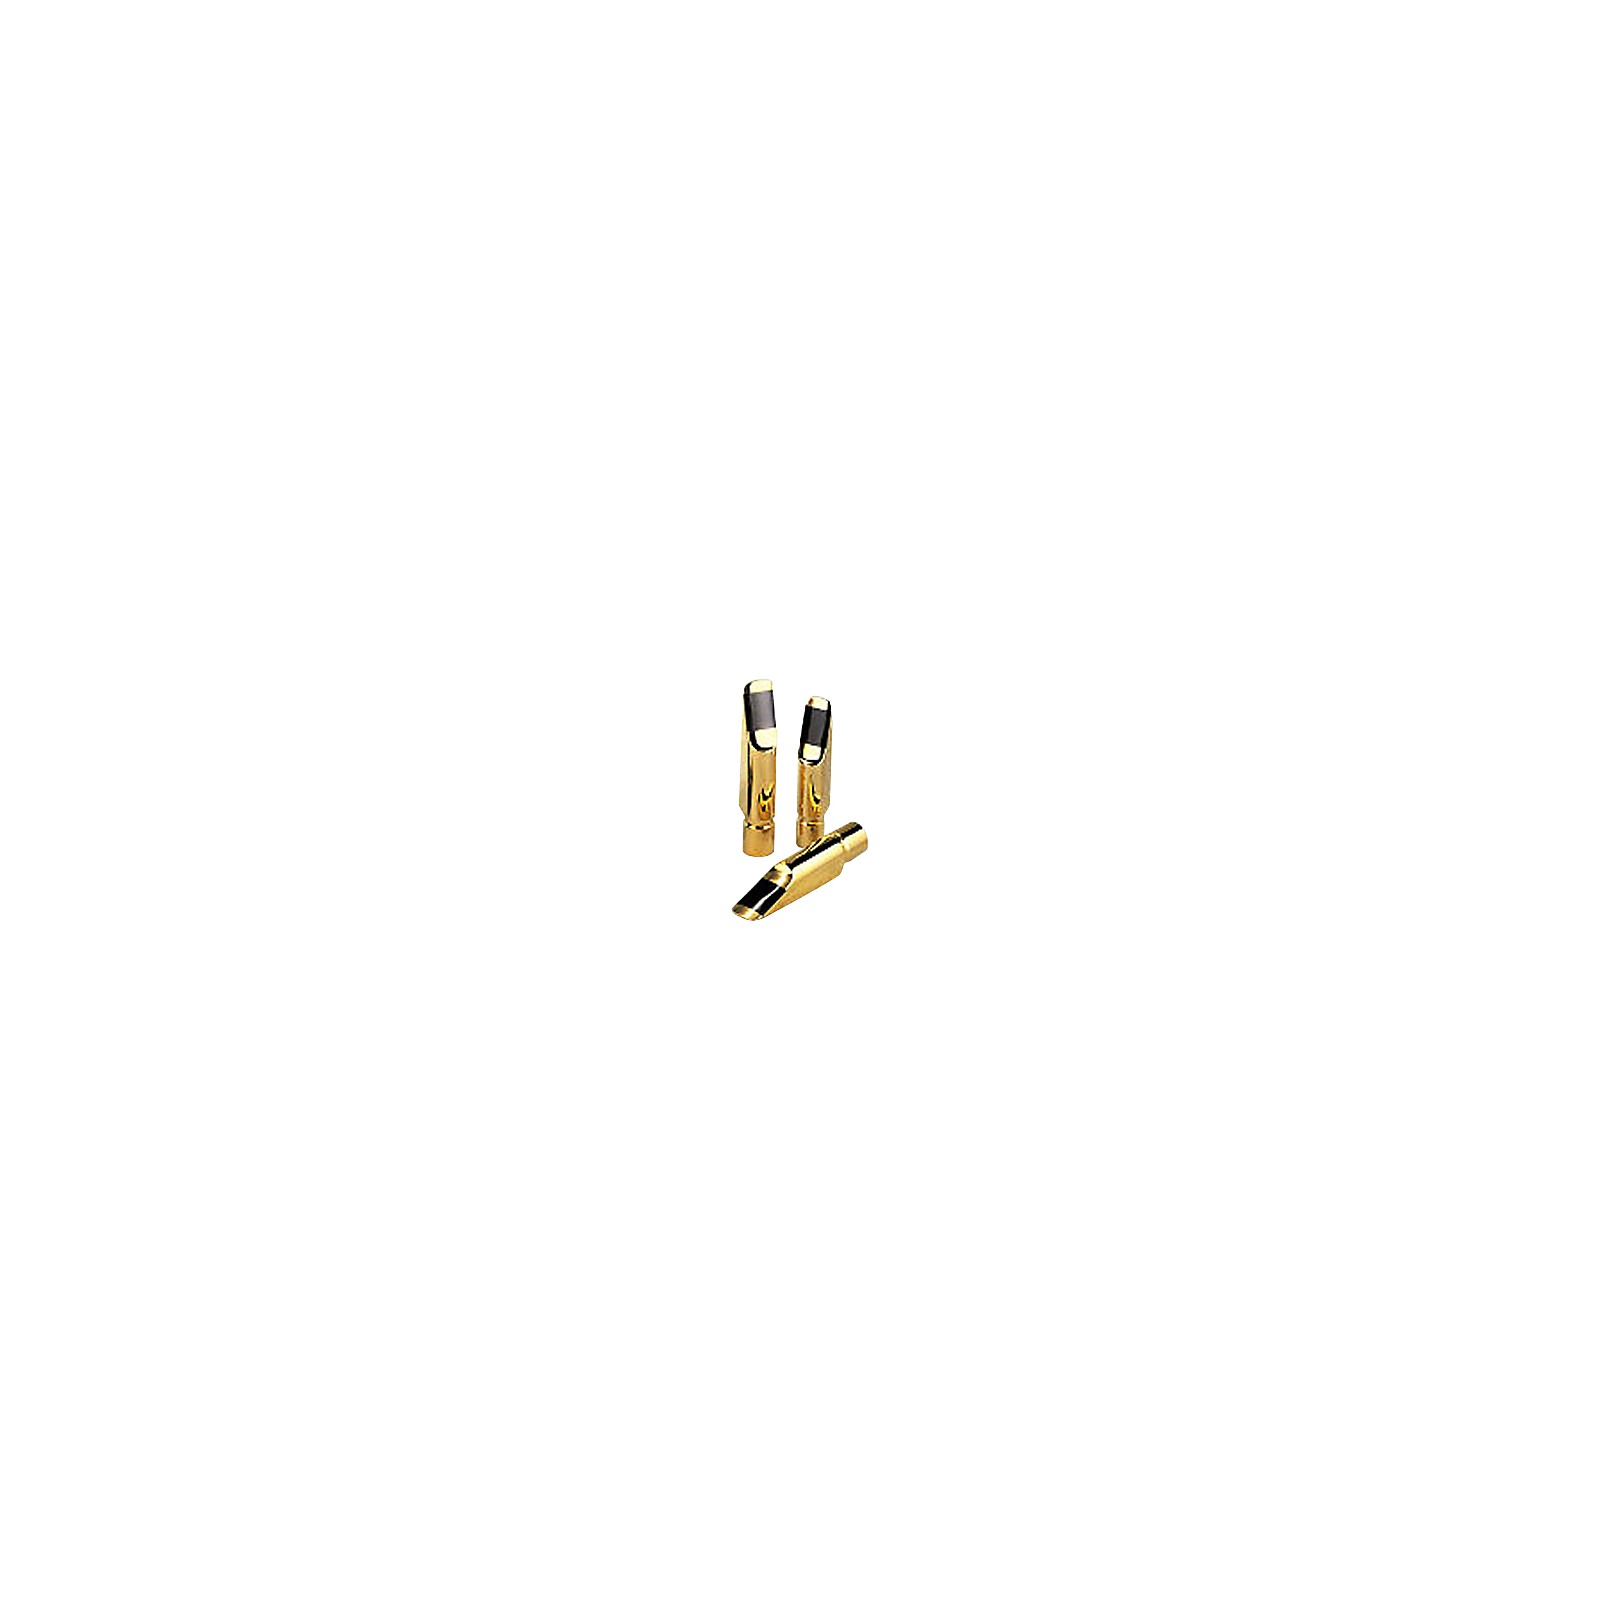 E. Rousseau Jazz Metal Tenor Saxophone Mouthpiece